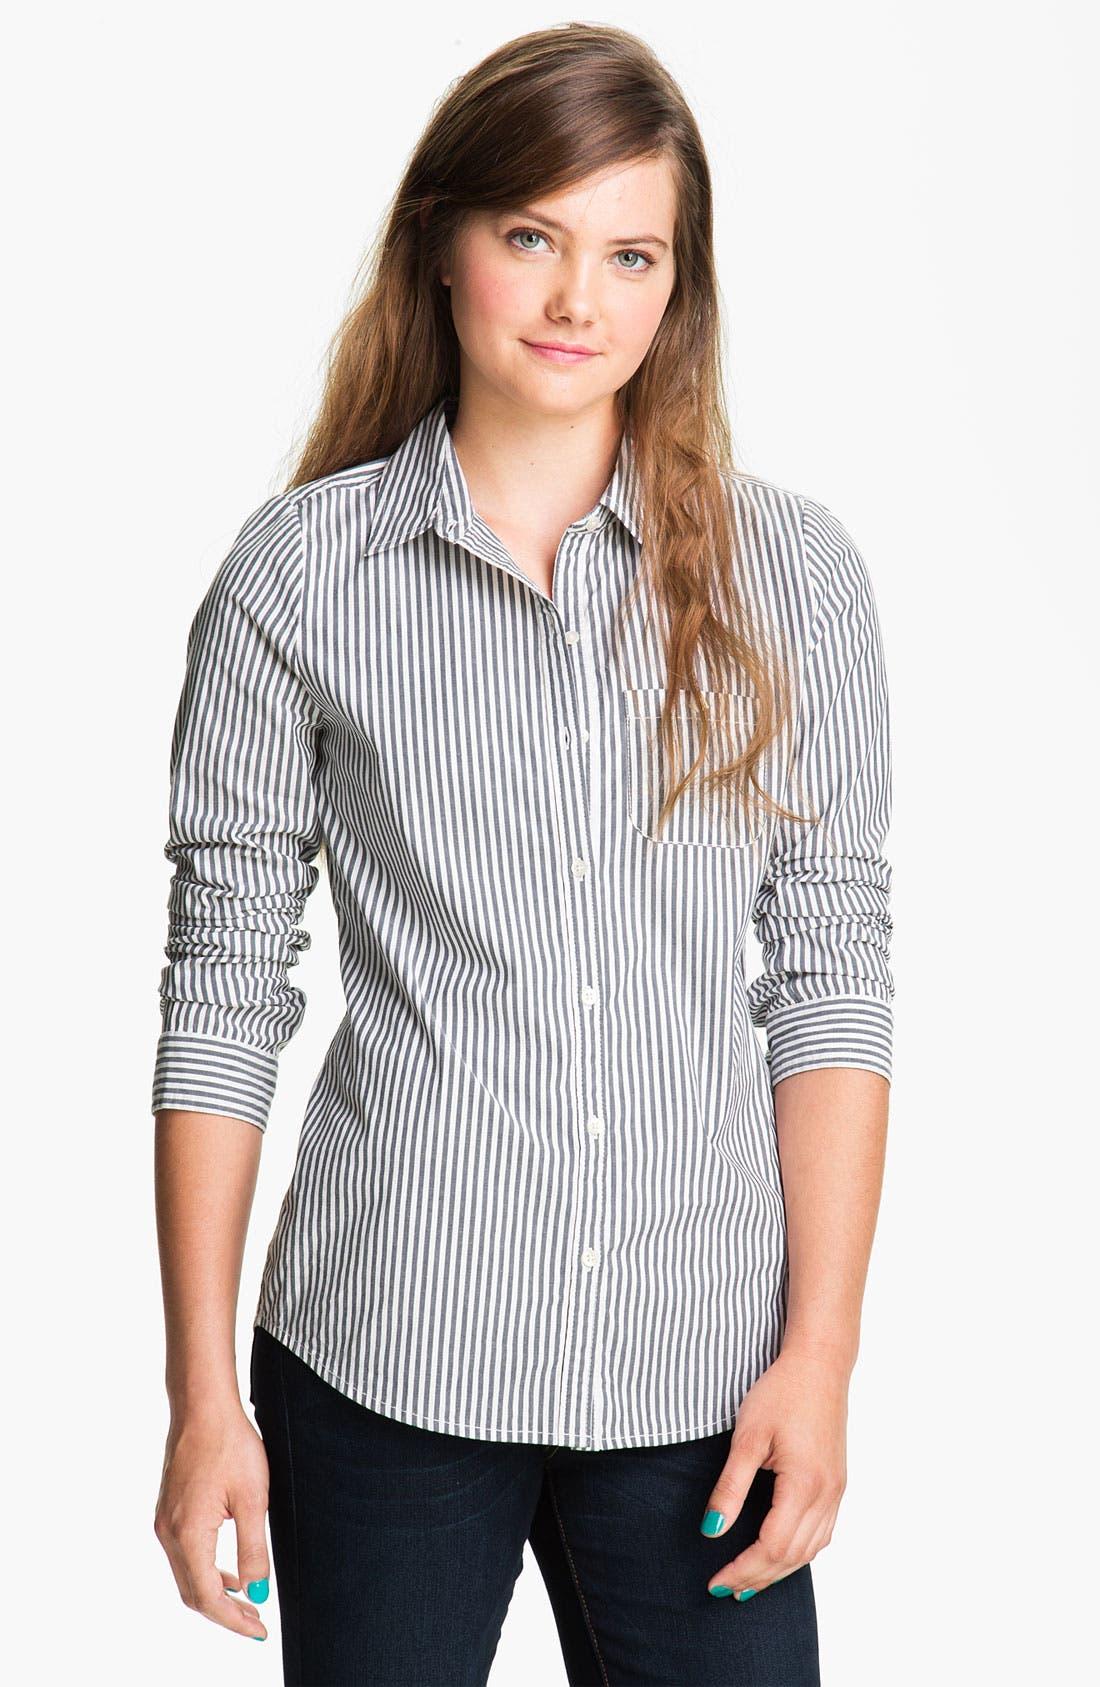 Alternate Image 1 Selected - BP. 'Shrunken Prep' Shirt (Juniors)